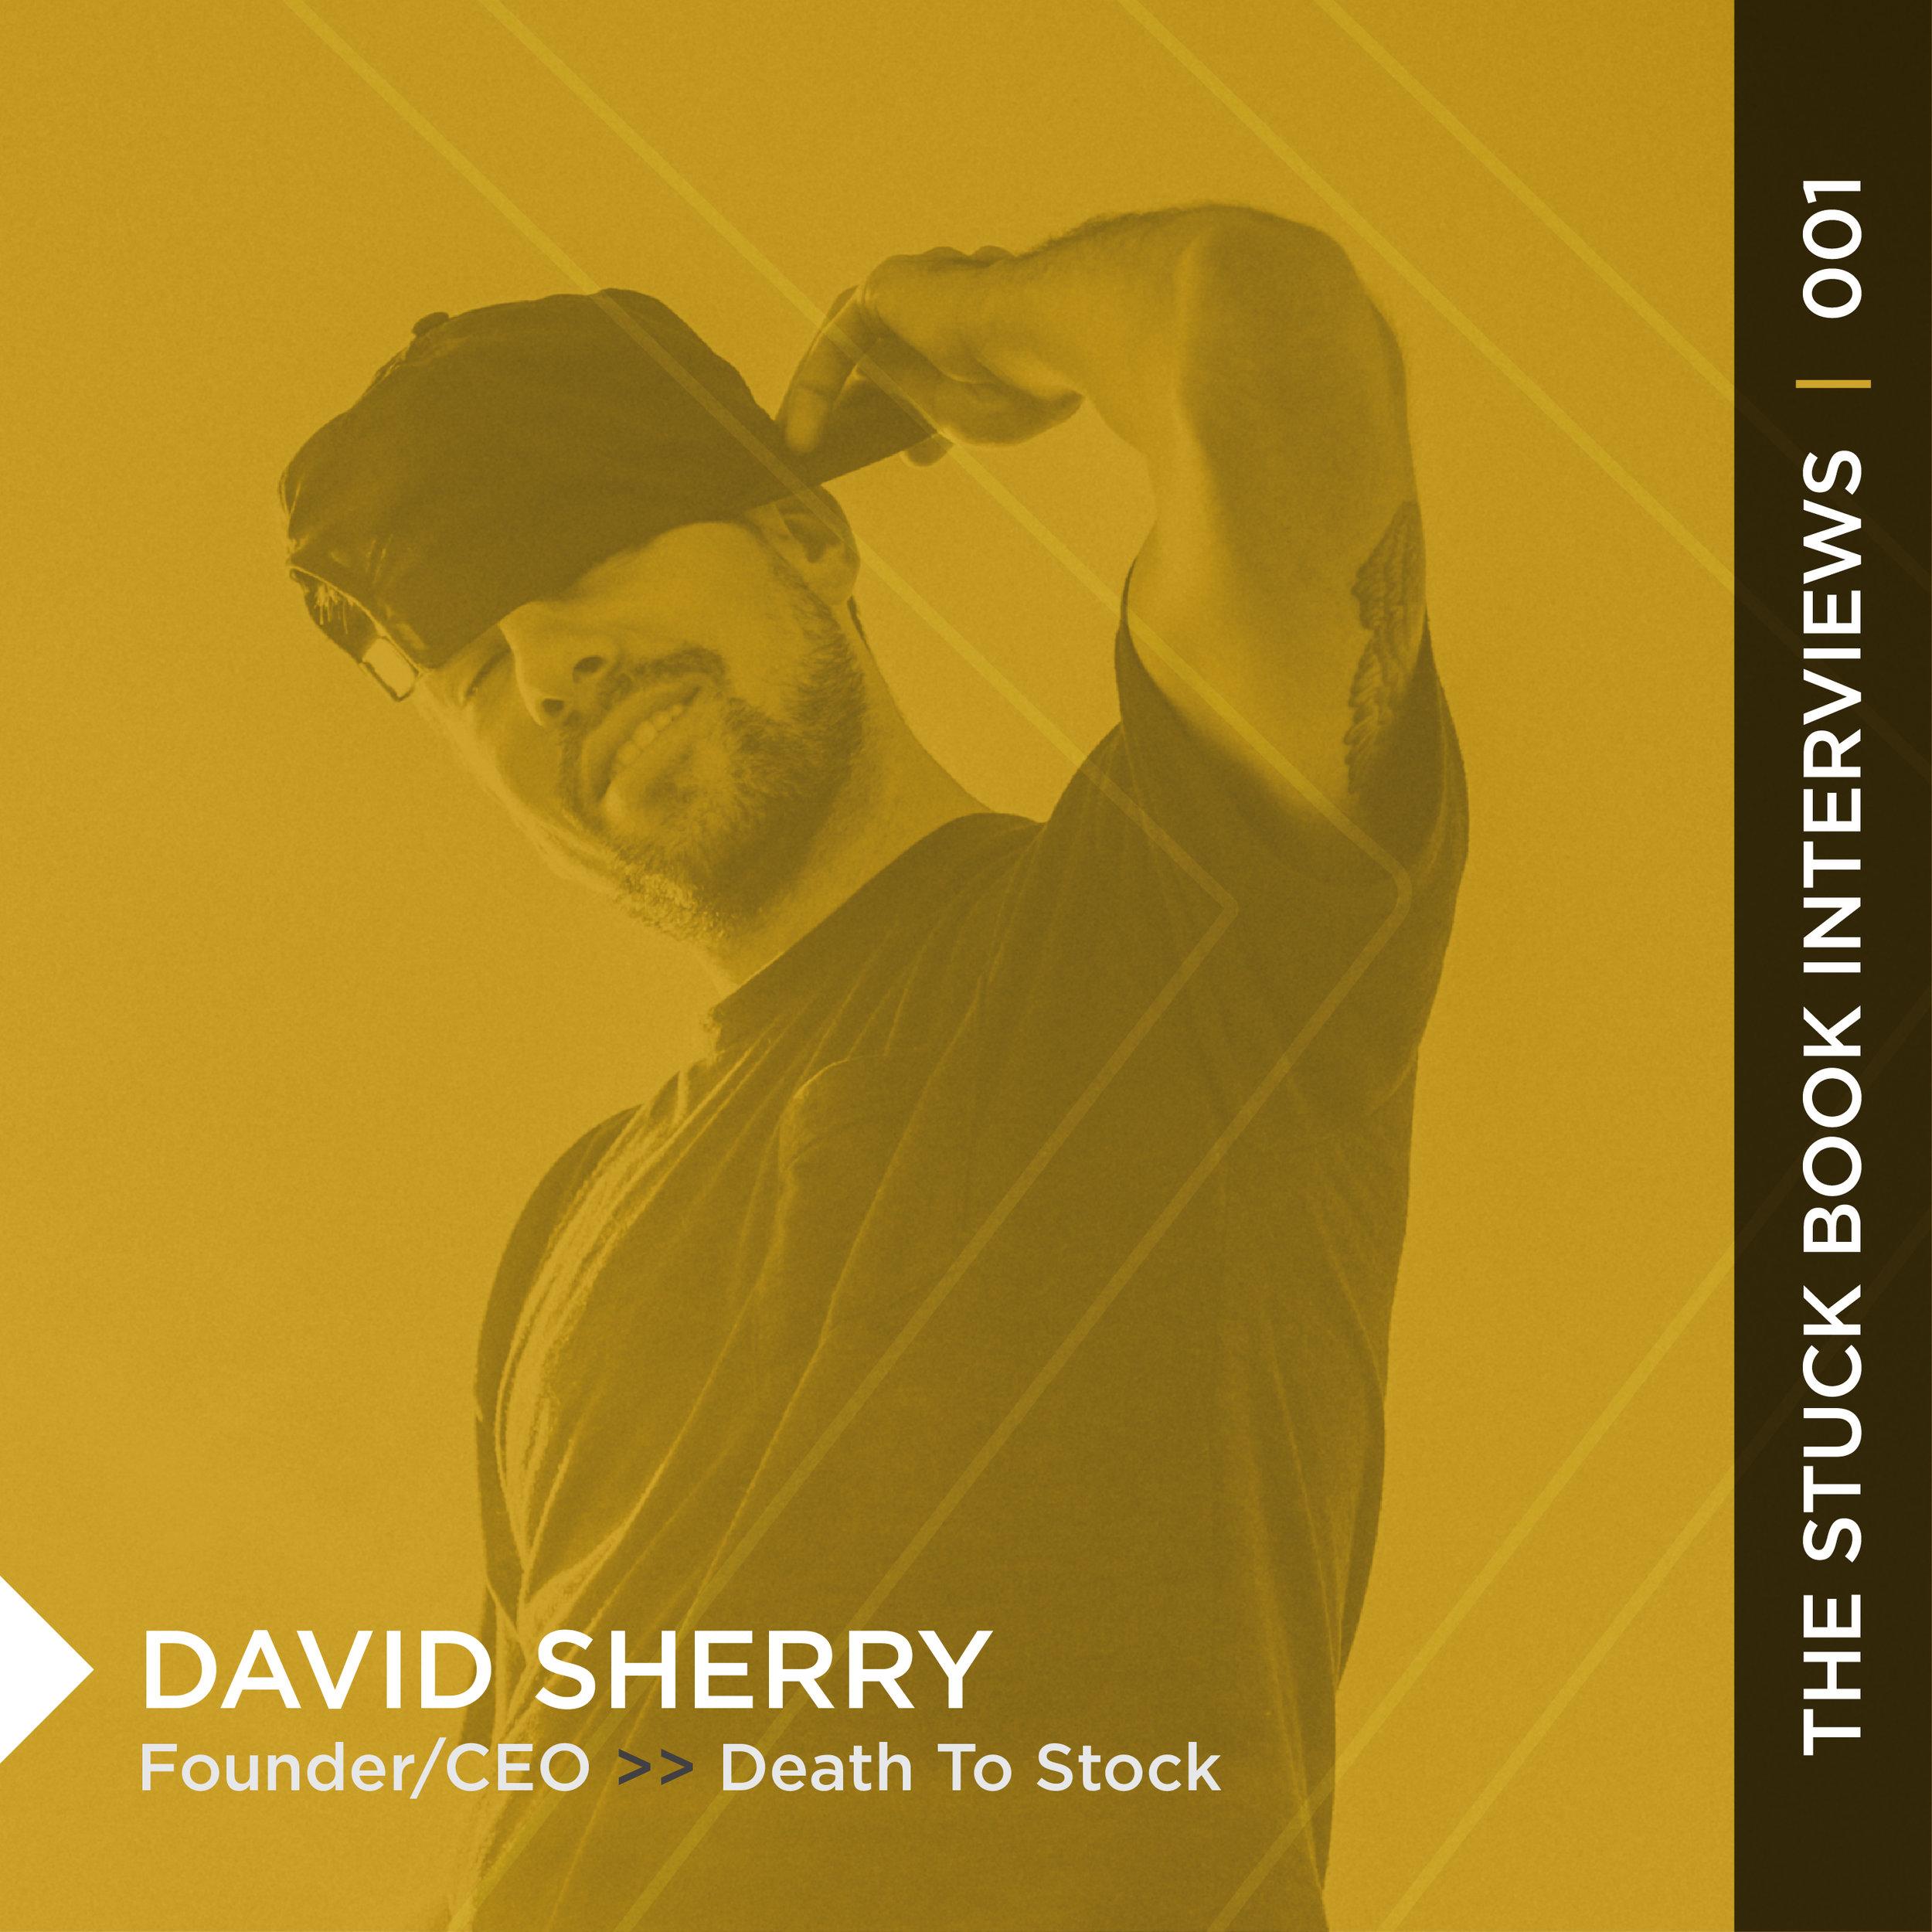 David Sherry